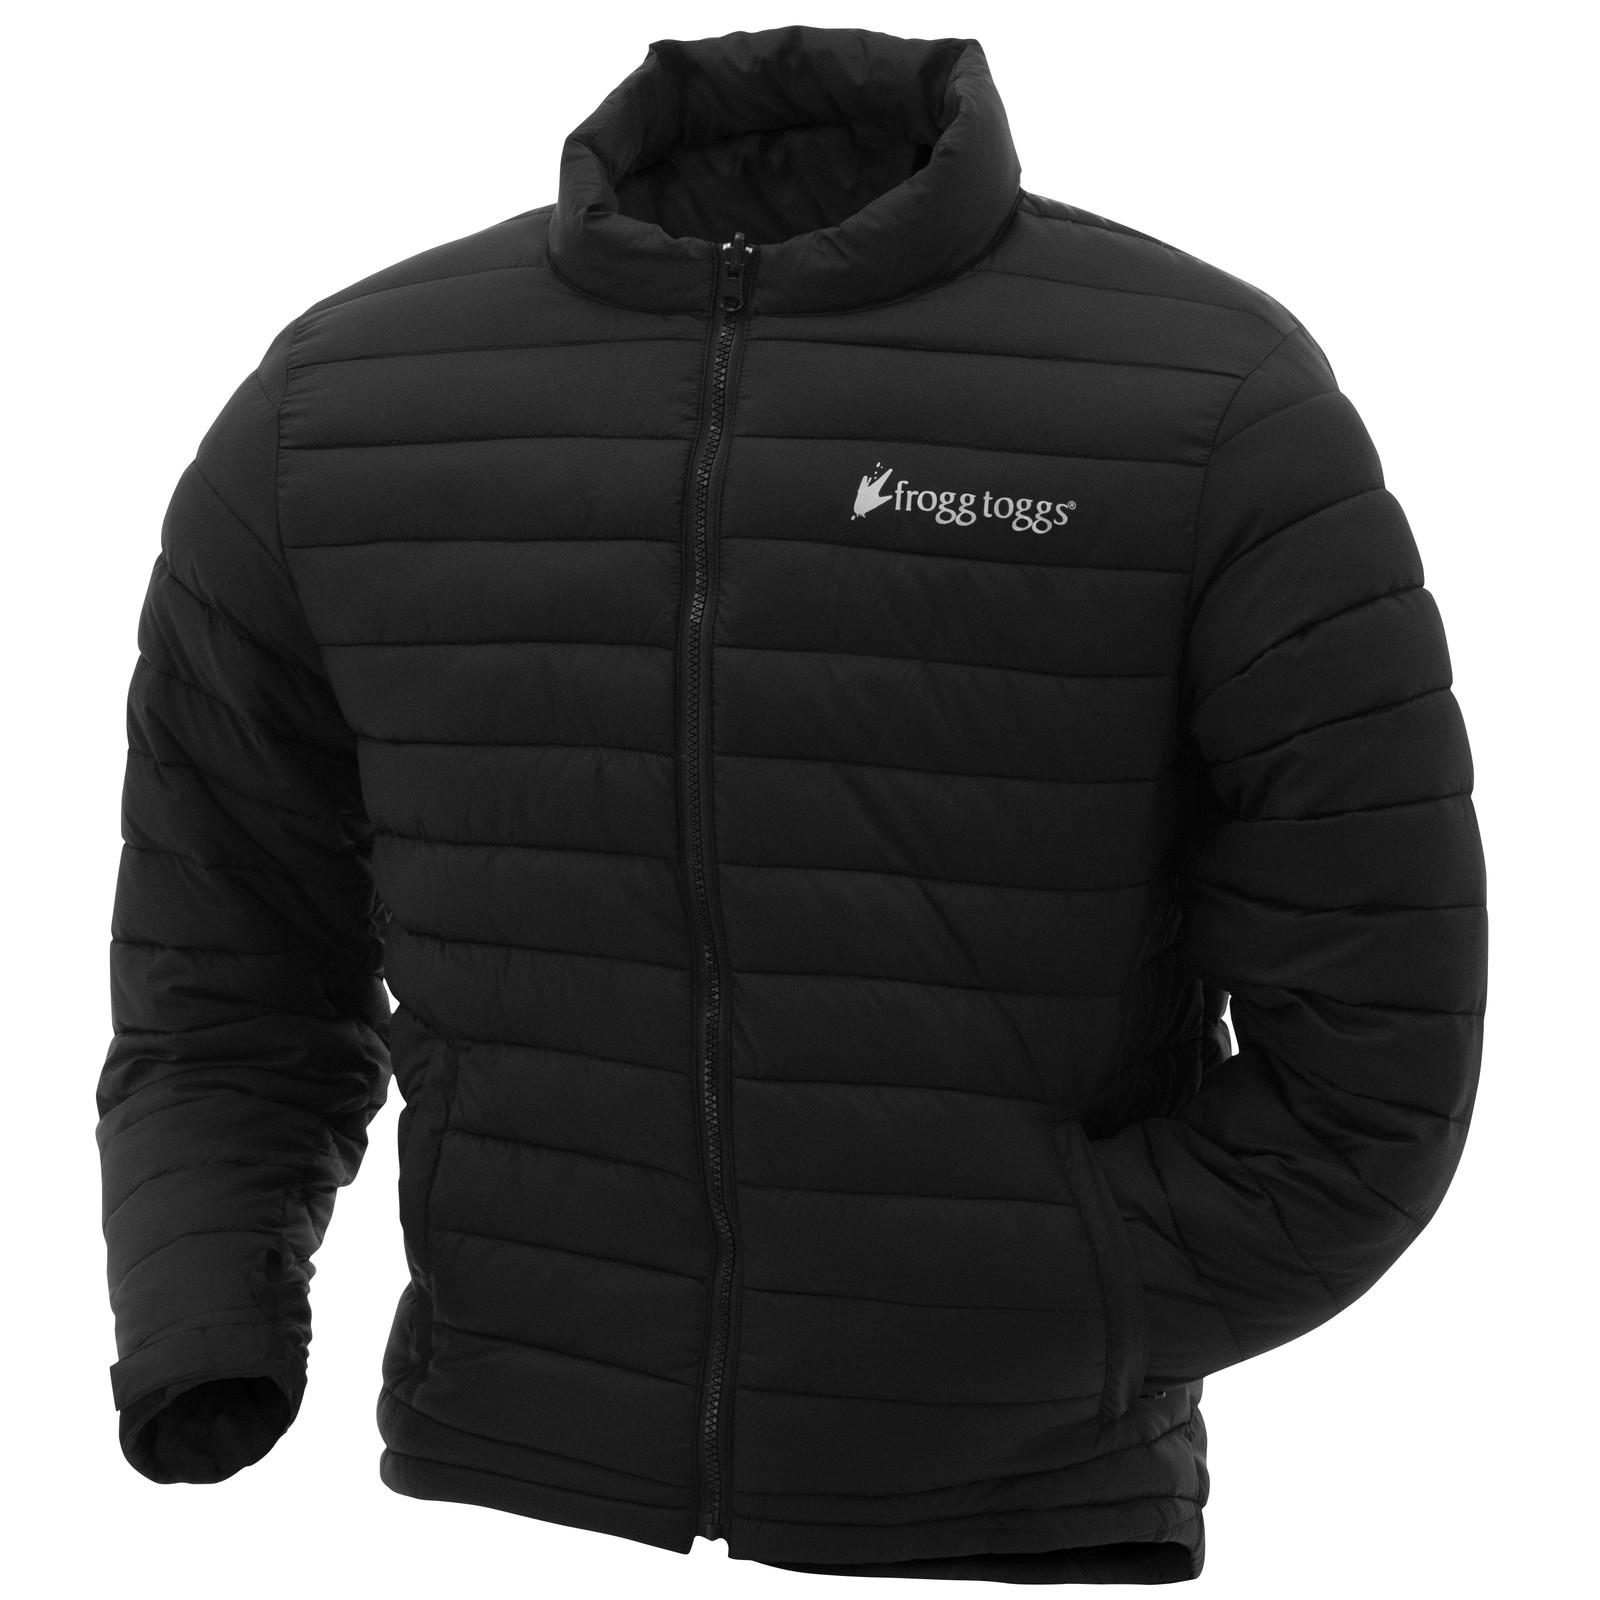 Men's Co-Pilot Insulated Jacket-large